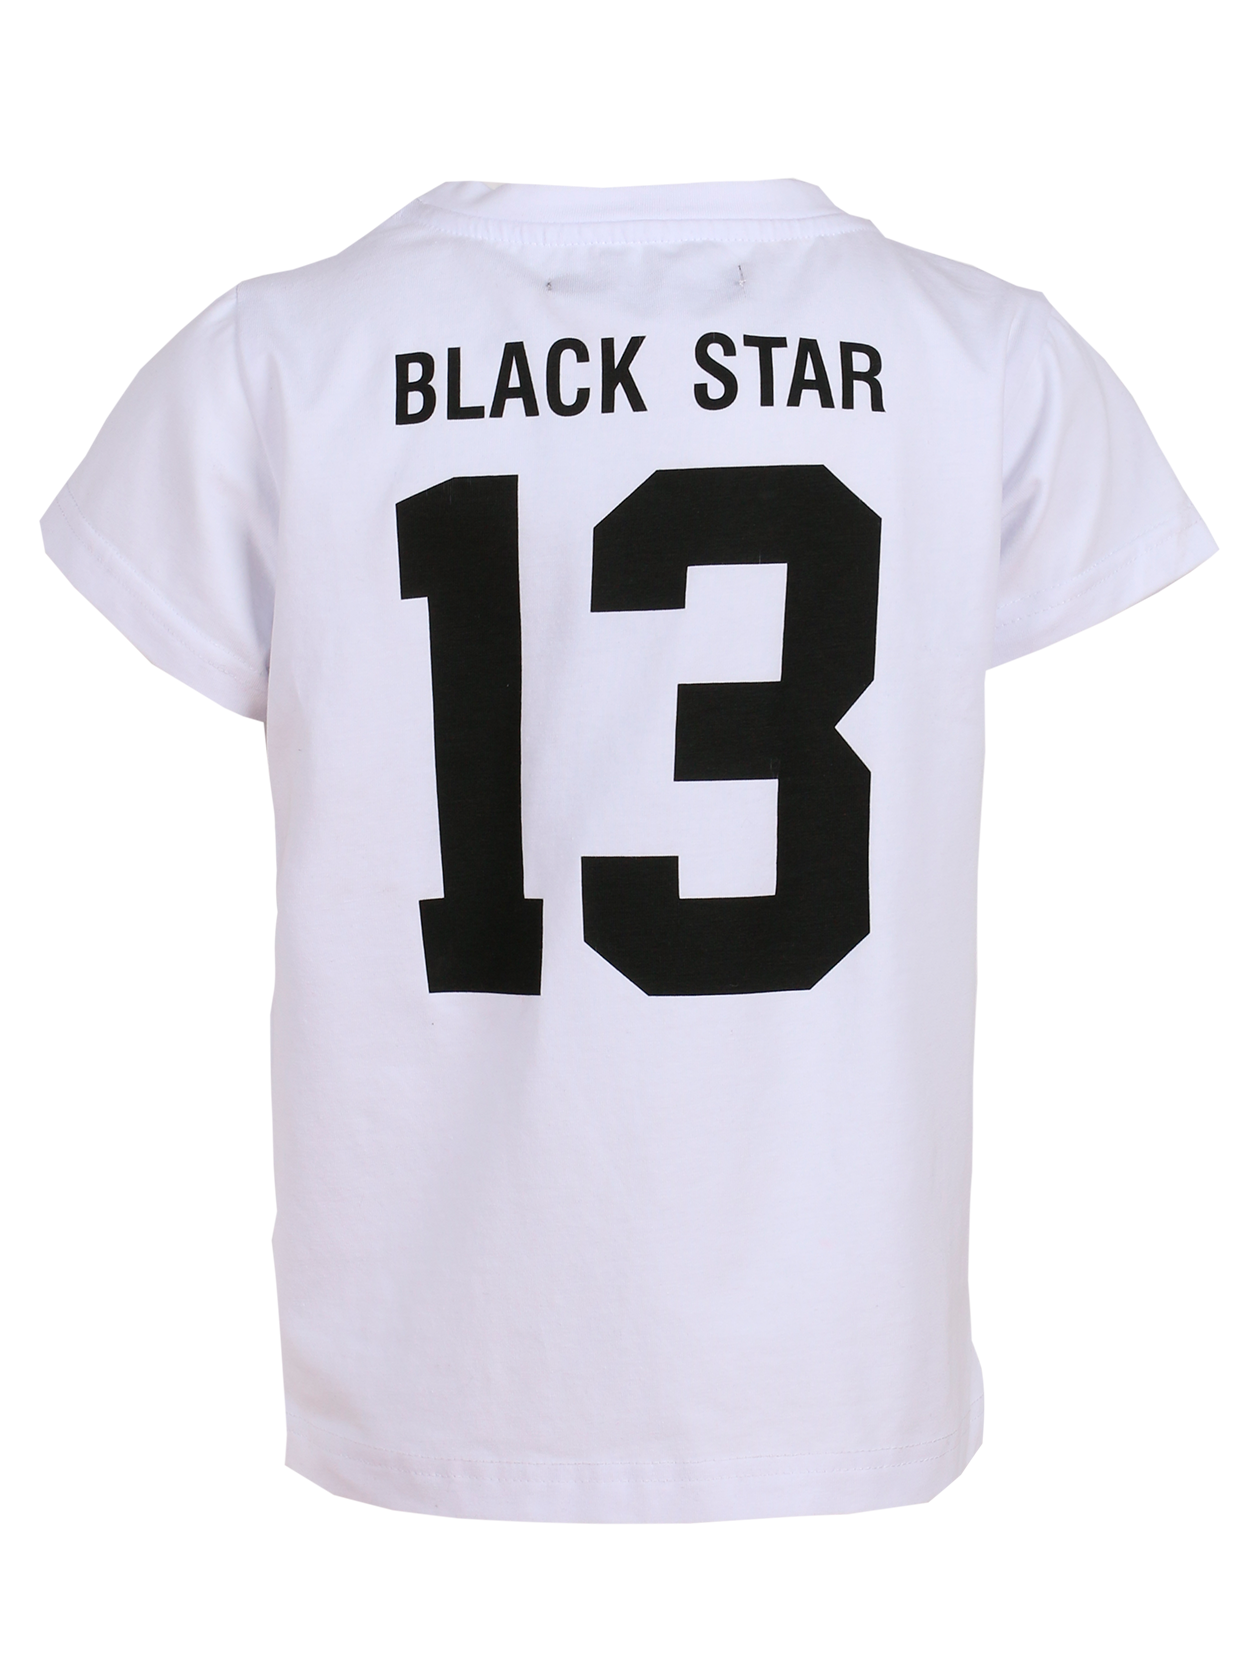 Футболка детская BLACK STAR 13 от Black Star